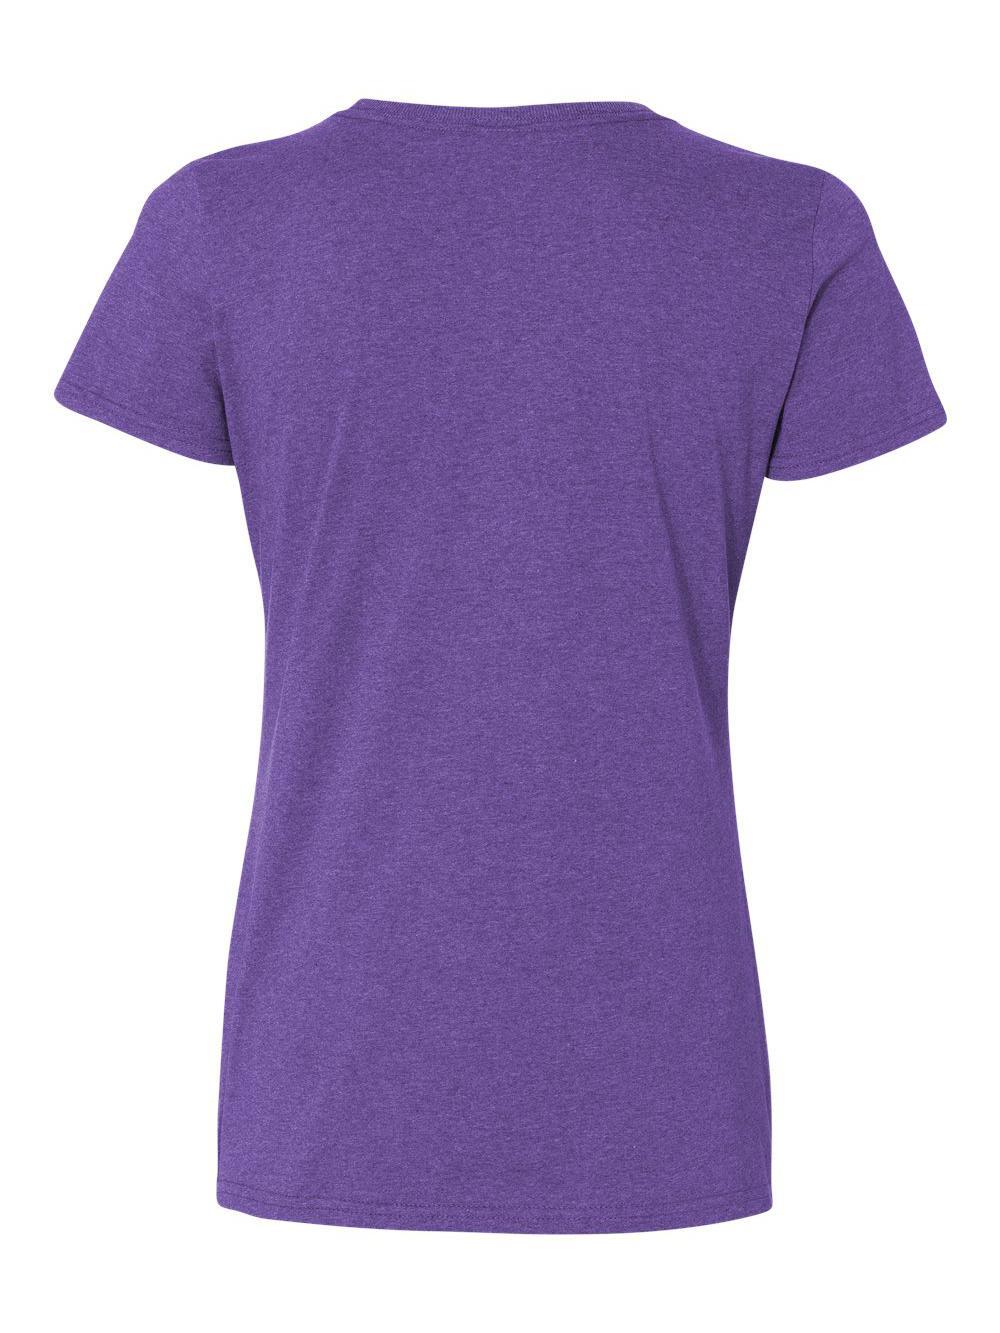 Fruit-of-the-Loom-HD-Cotton-Women-039-s-Short-Sleeve-T-Shirt-L3930R thumbnail 31